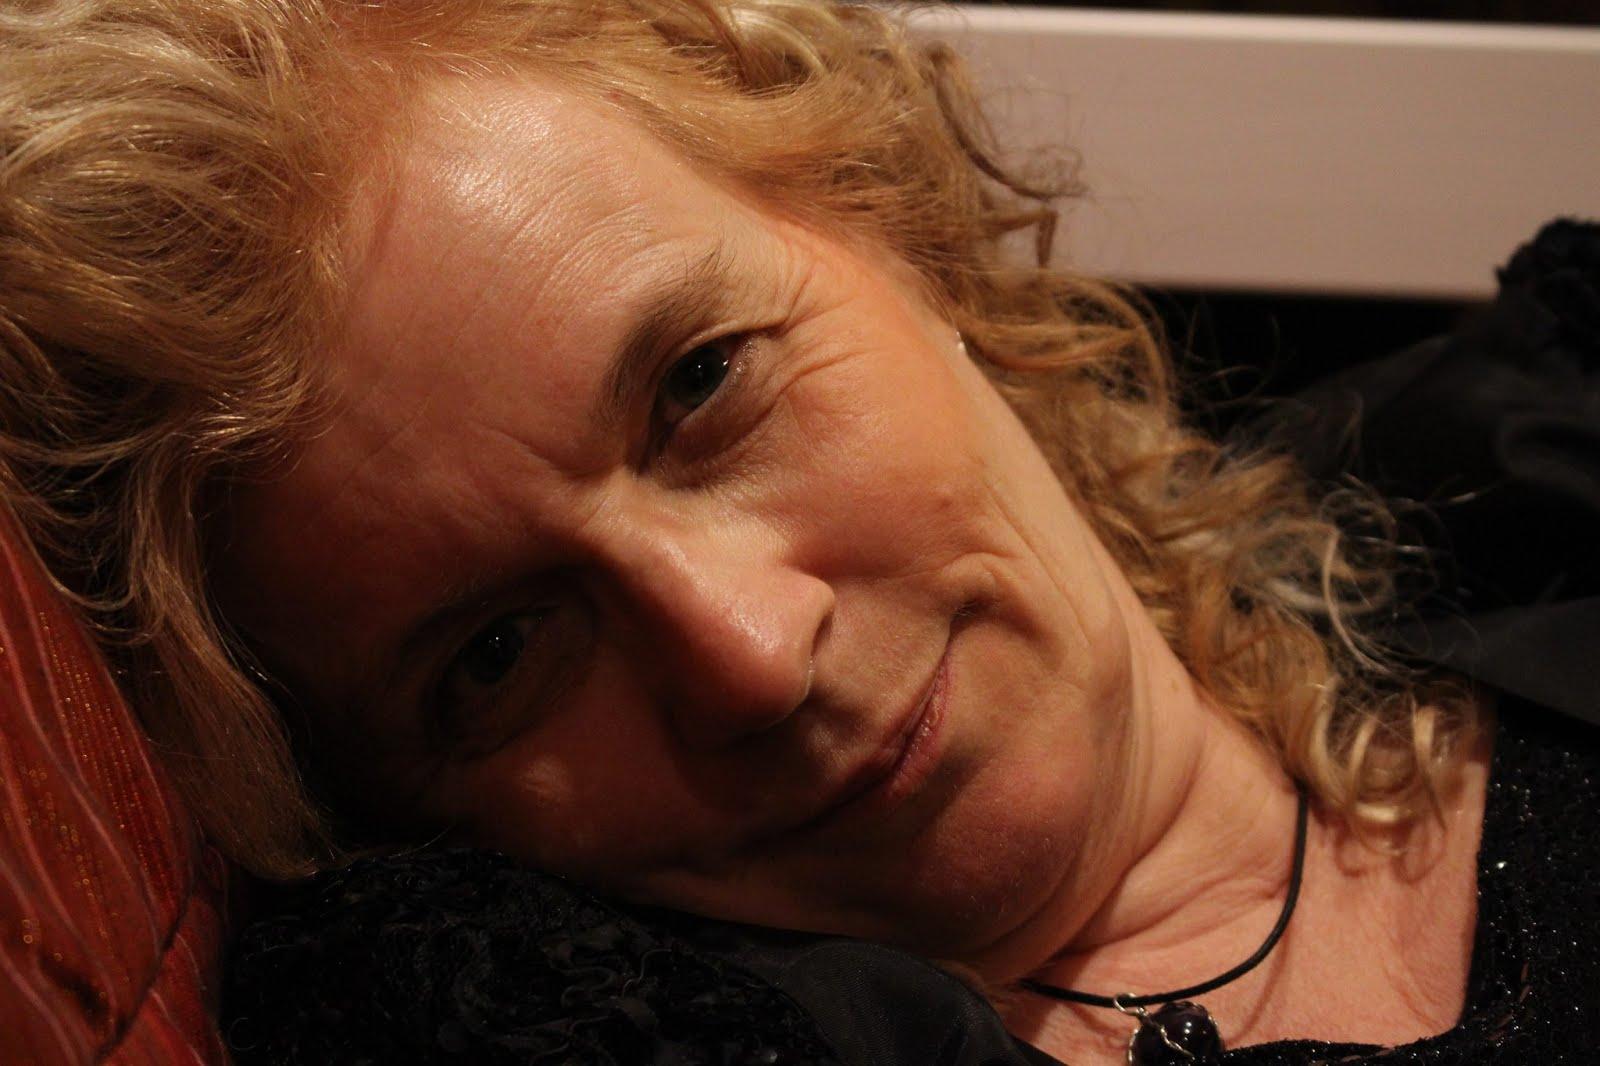 intim massage malmö escort kvinna stockholm